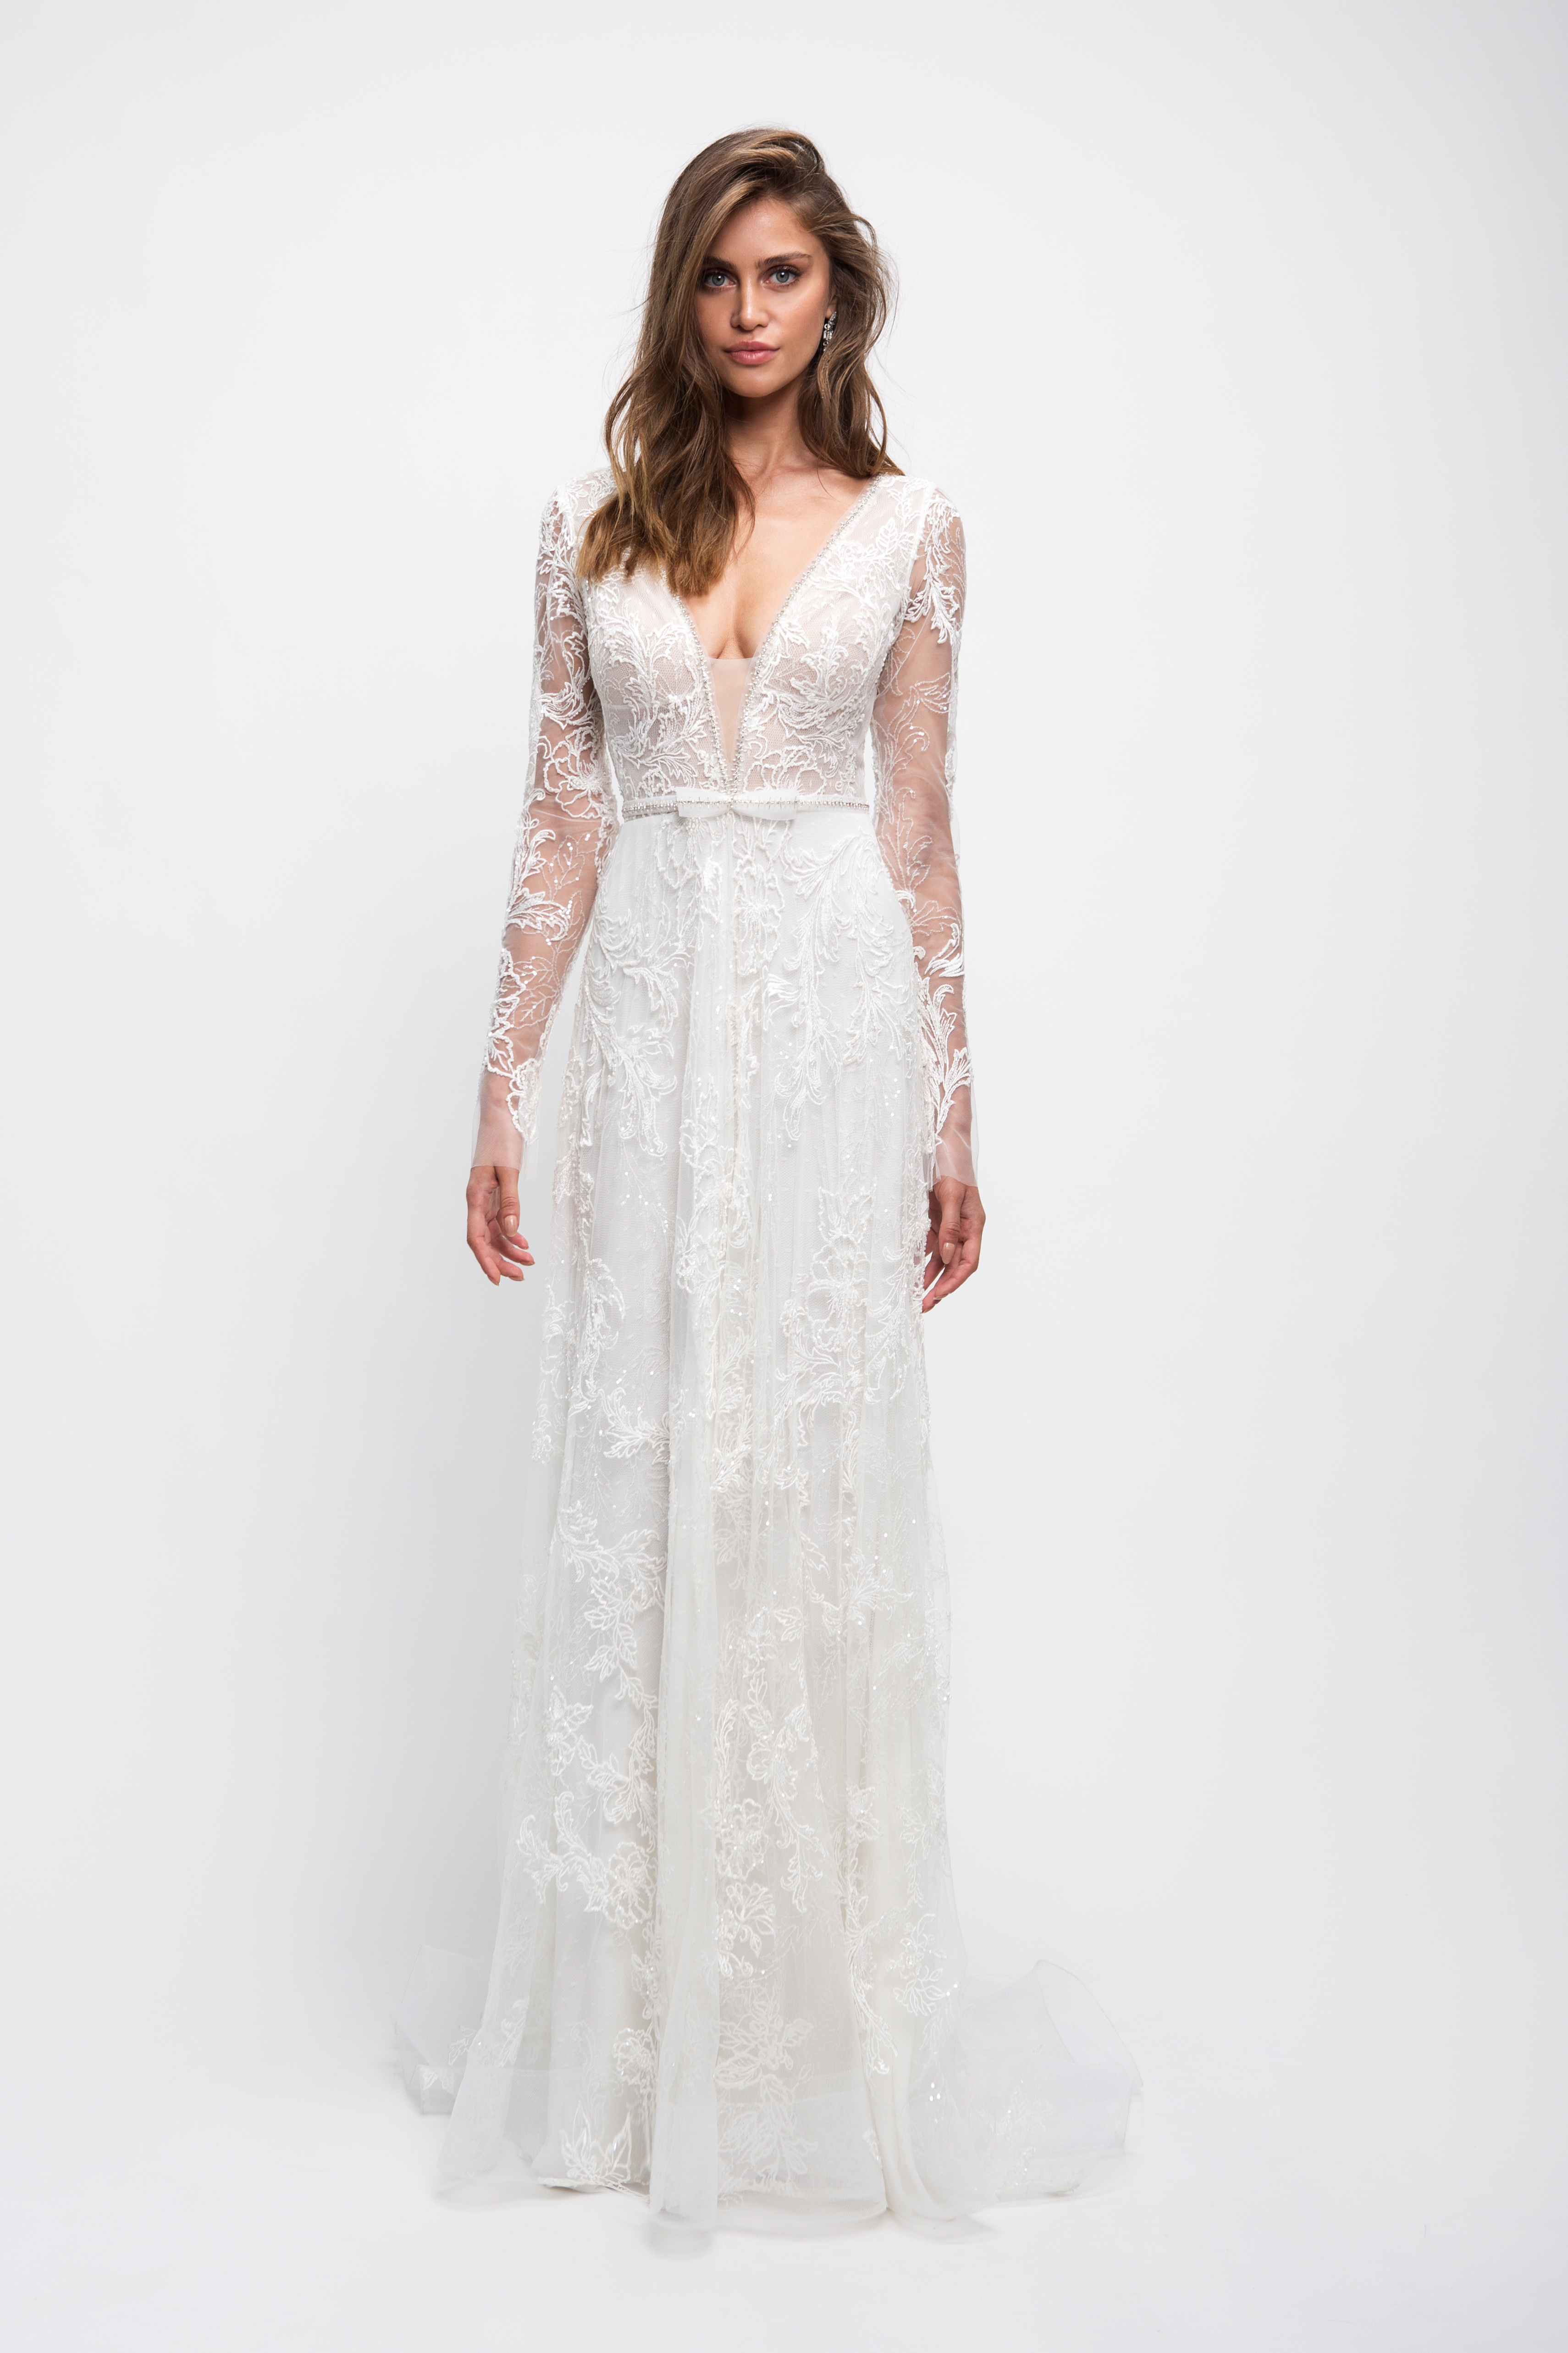 lihi hod wedding dress lace long sleeves v-neck